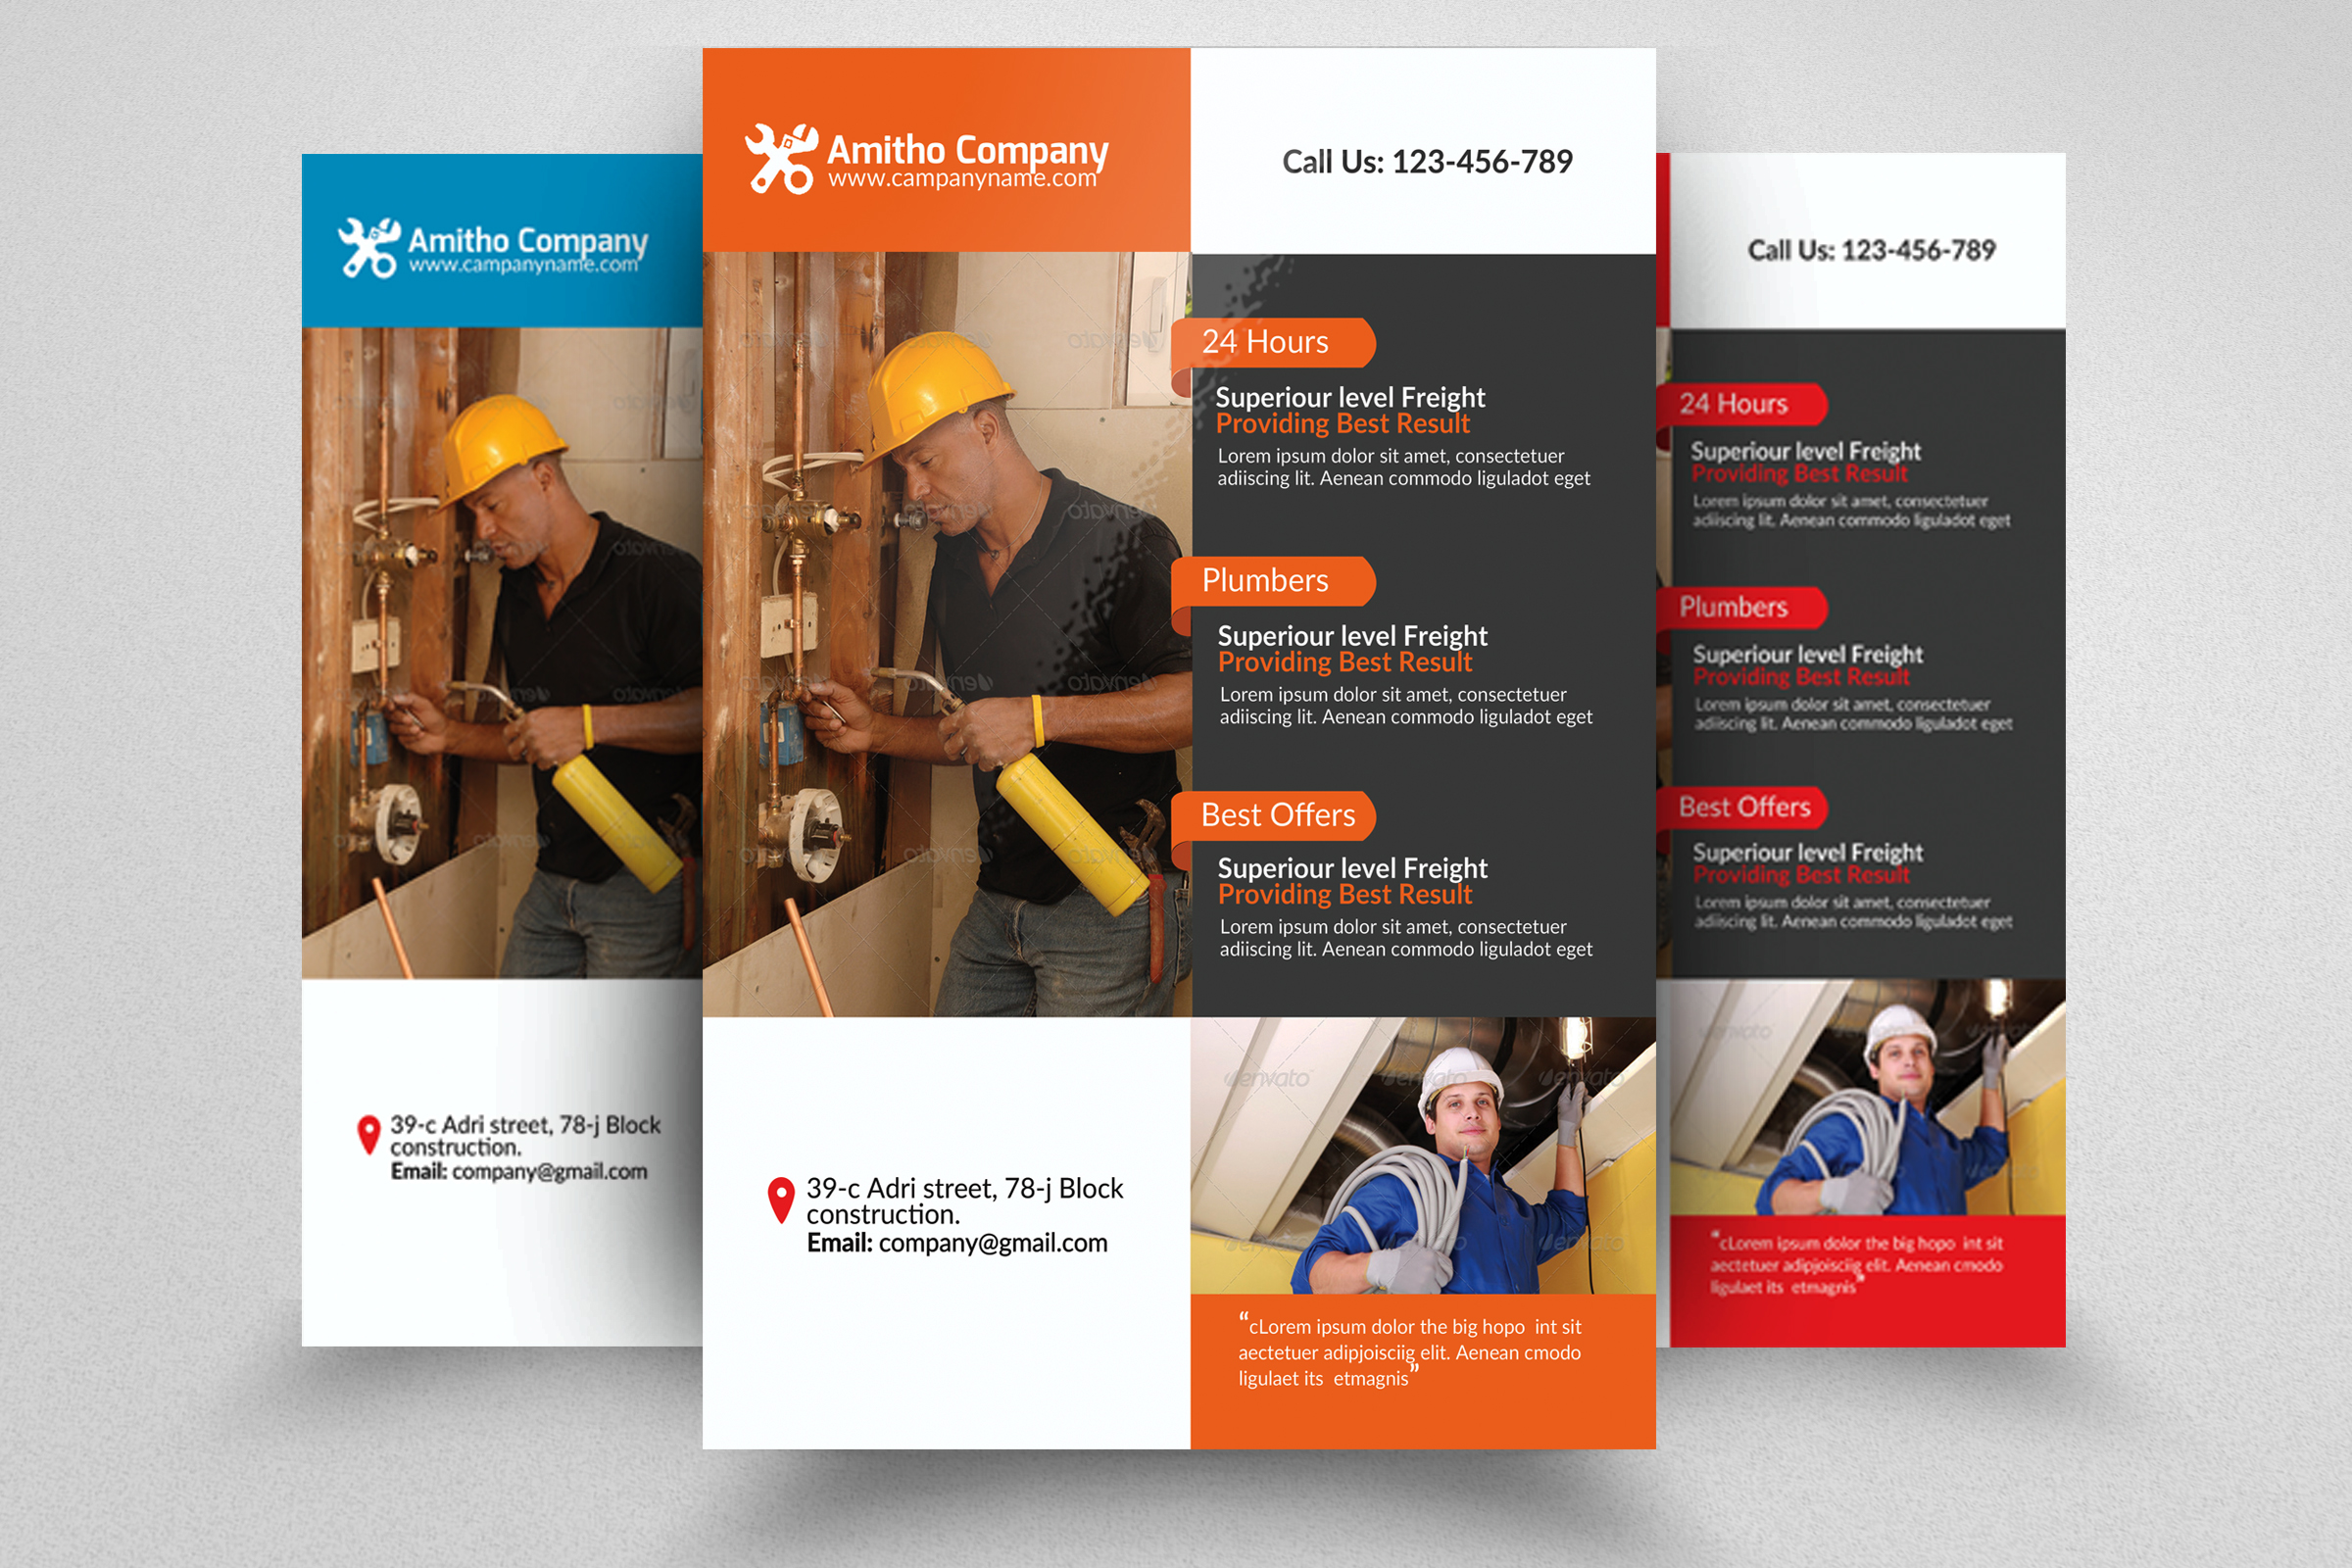 Handyman & Plumber Service Flyer example image 1